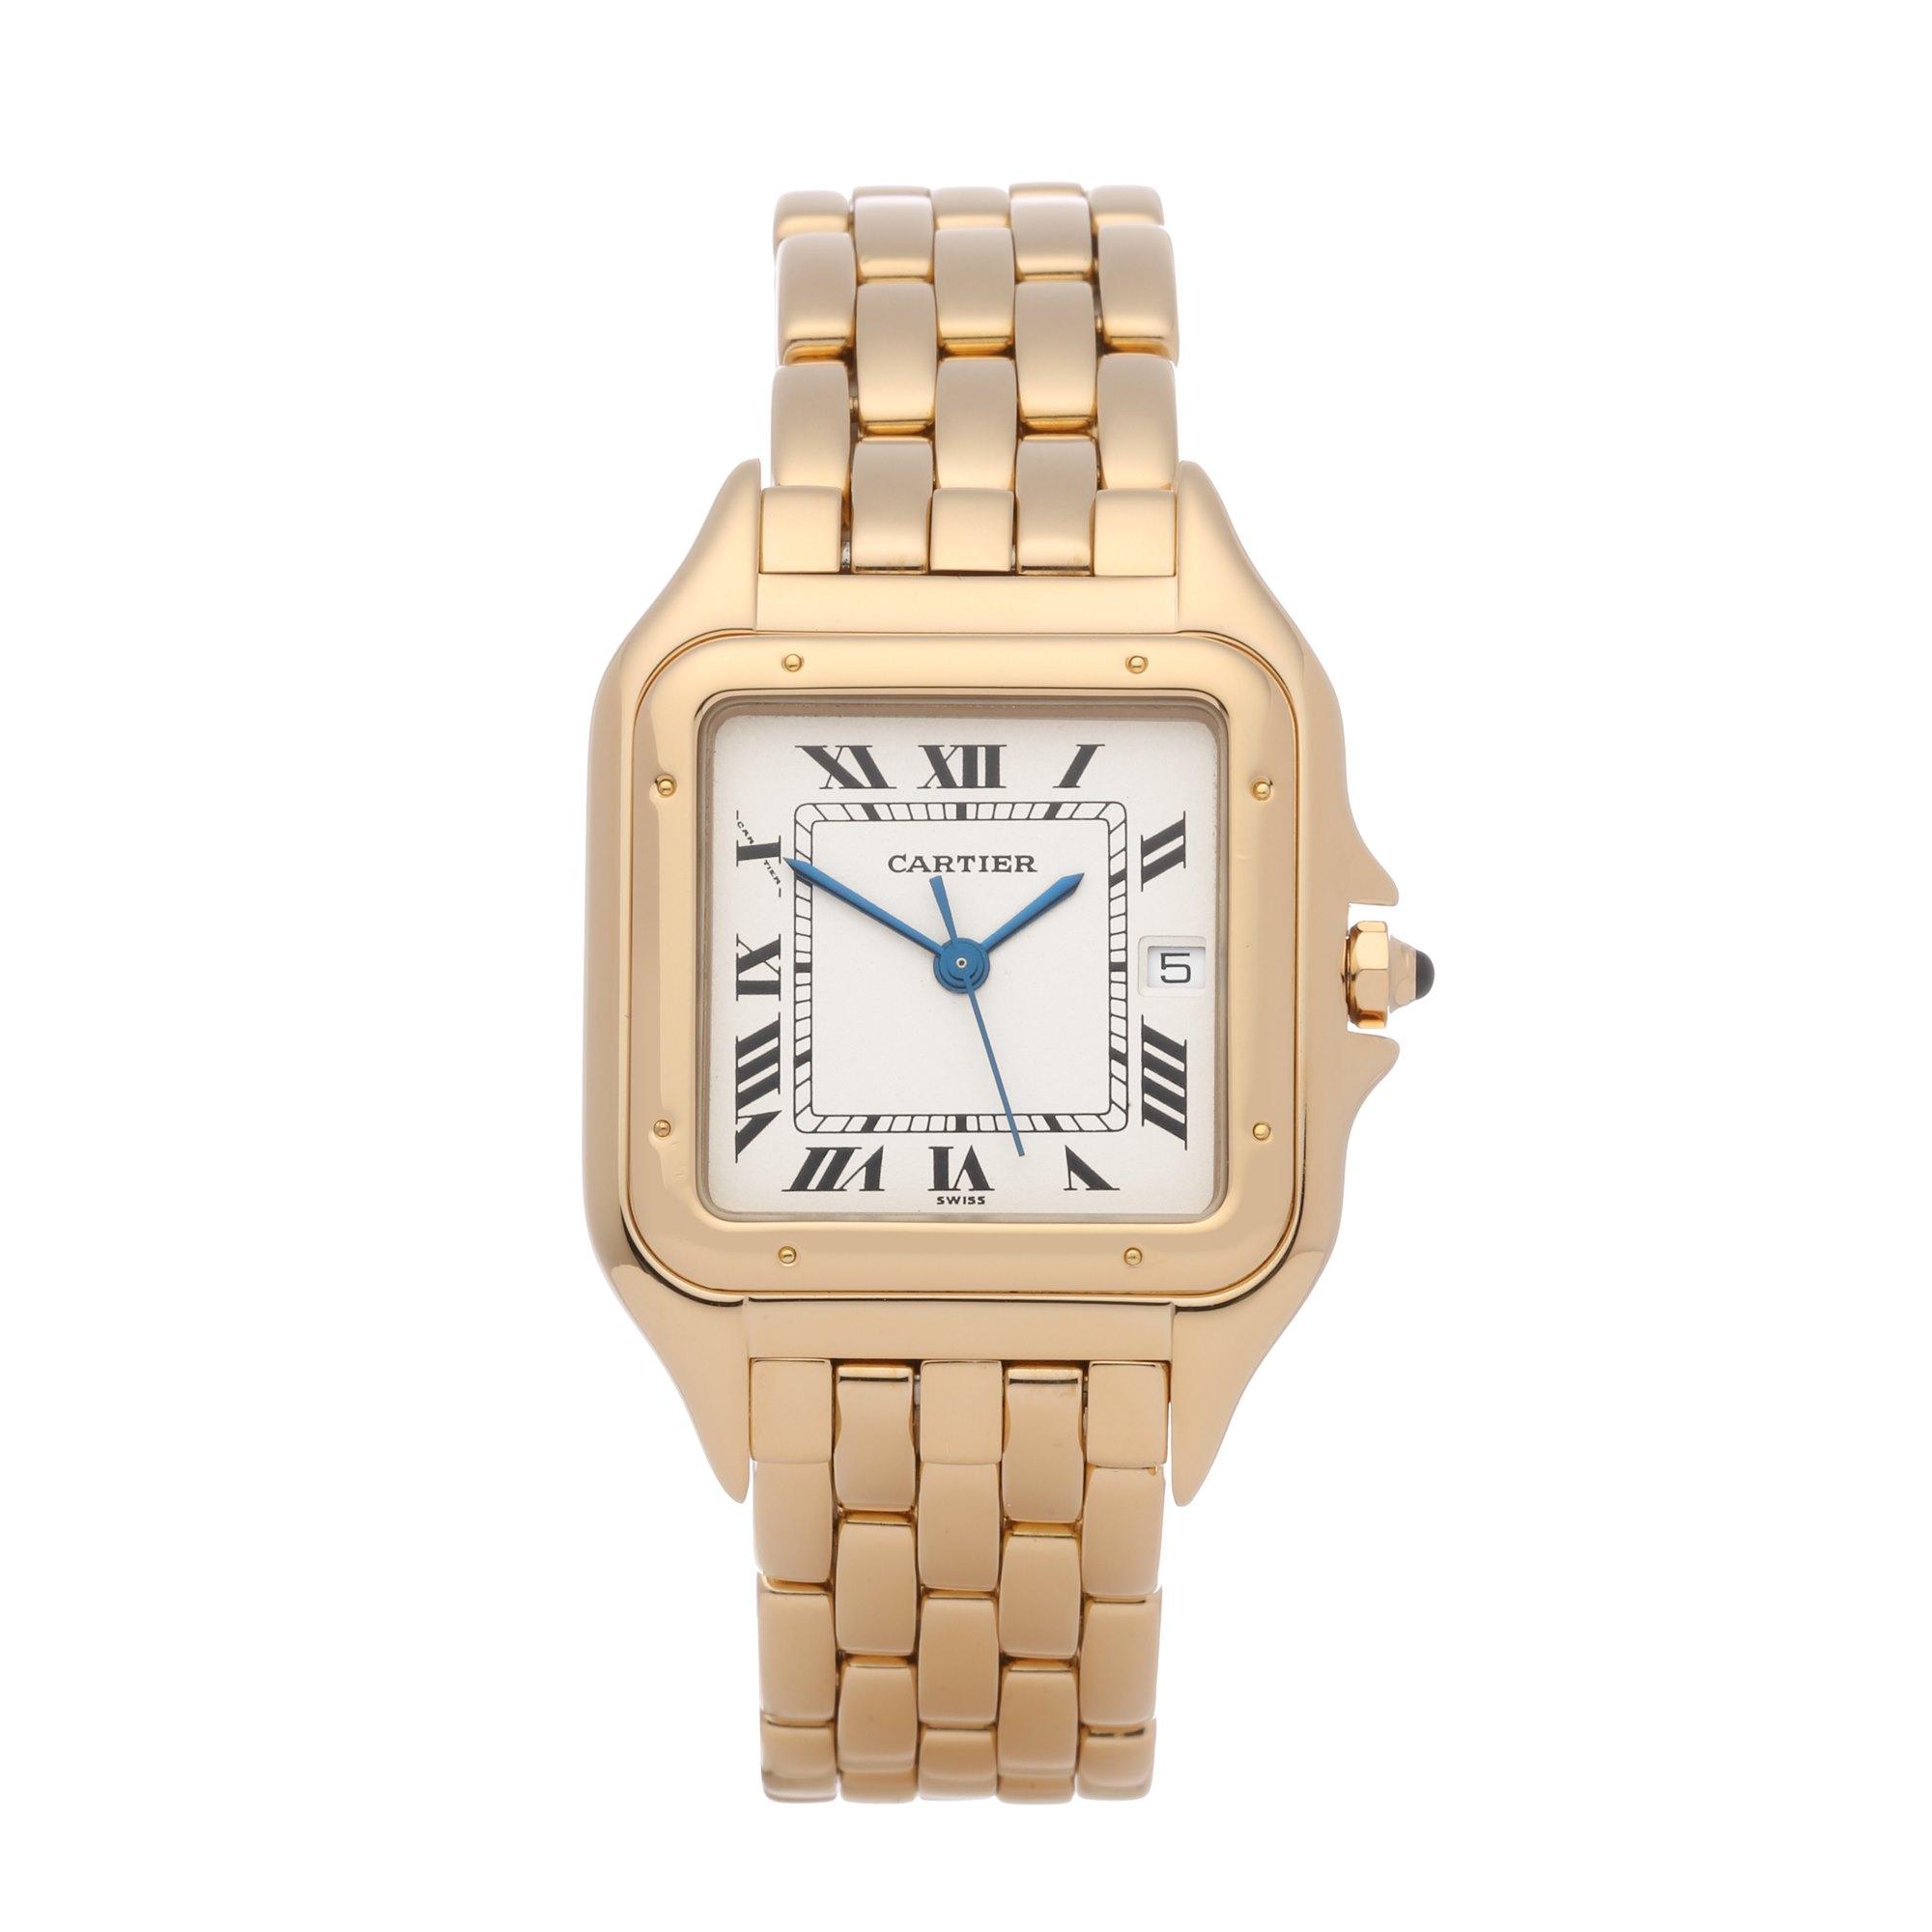 Cartier Panthère 18K Yellow Gold 887968